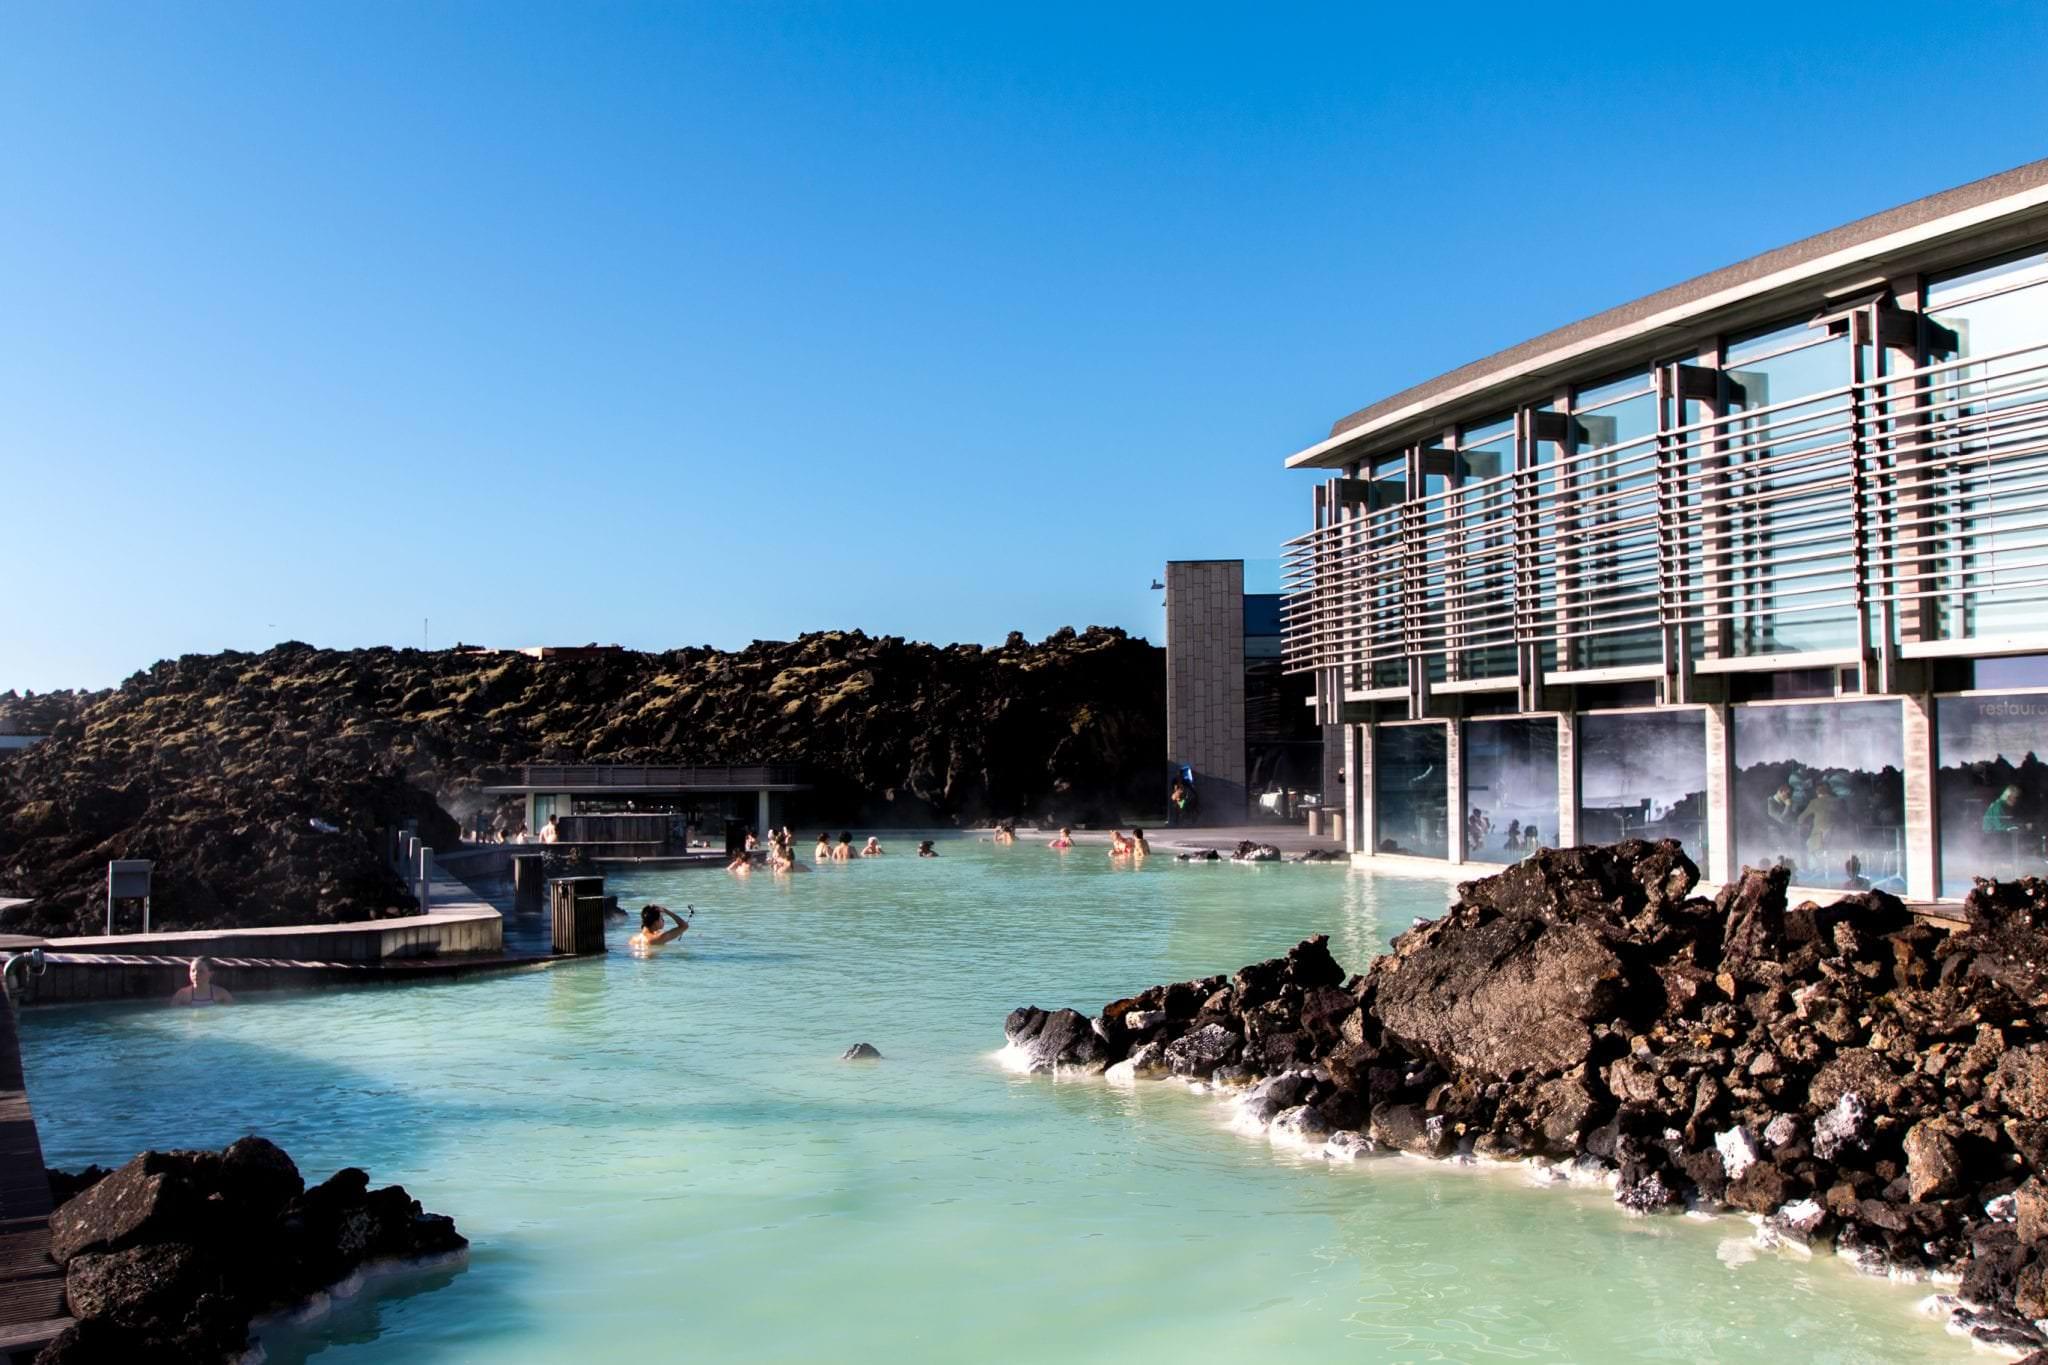 The Blue Lagoon in Reykjanes Peninsula